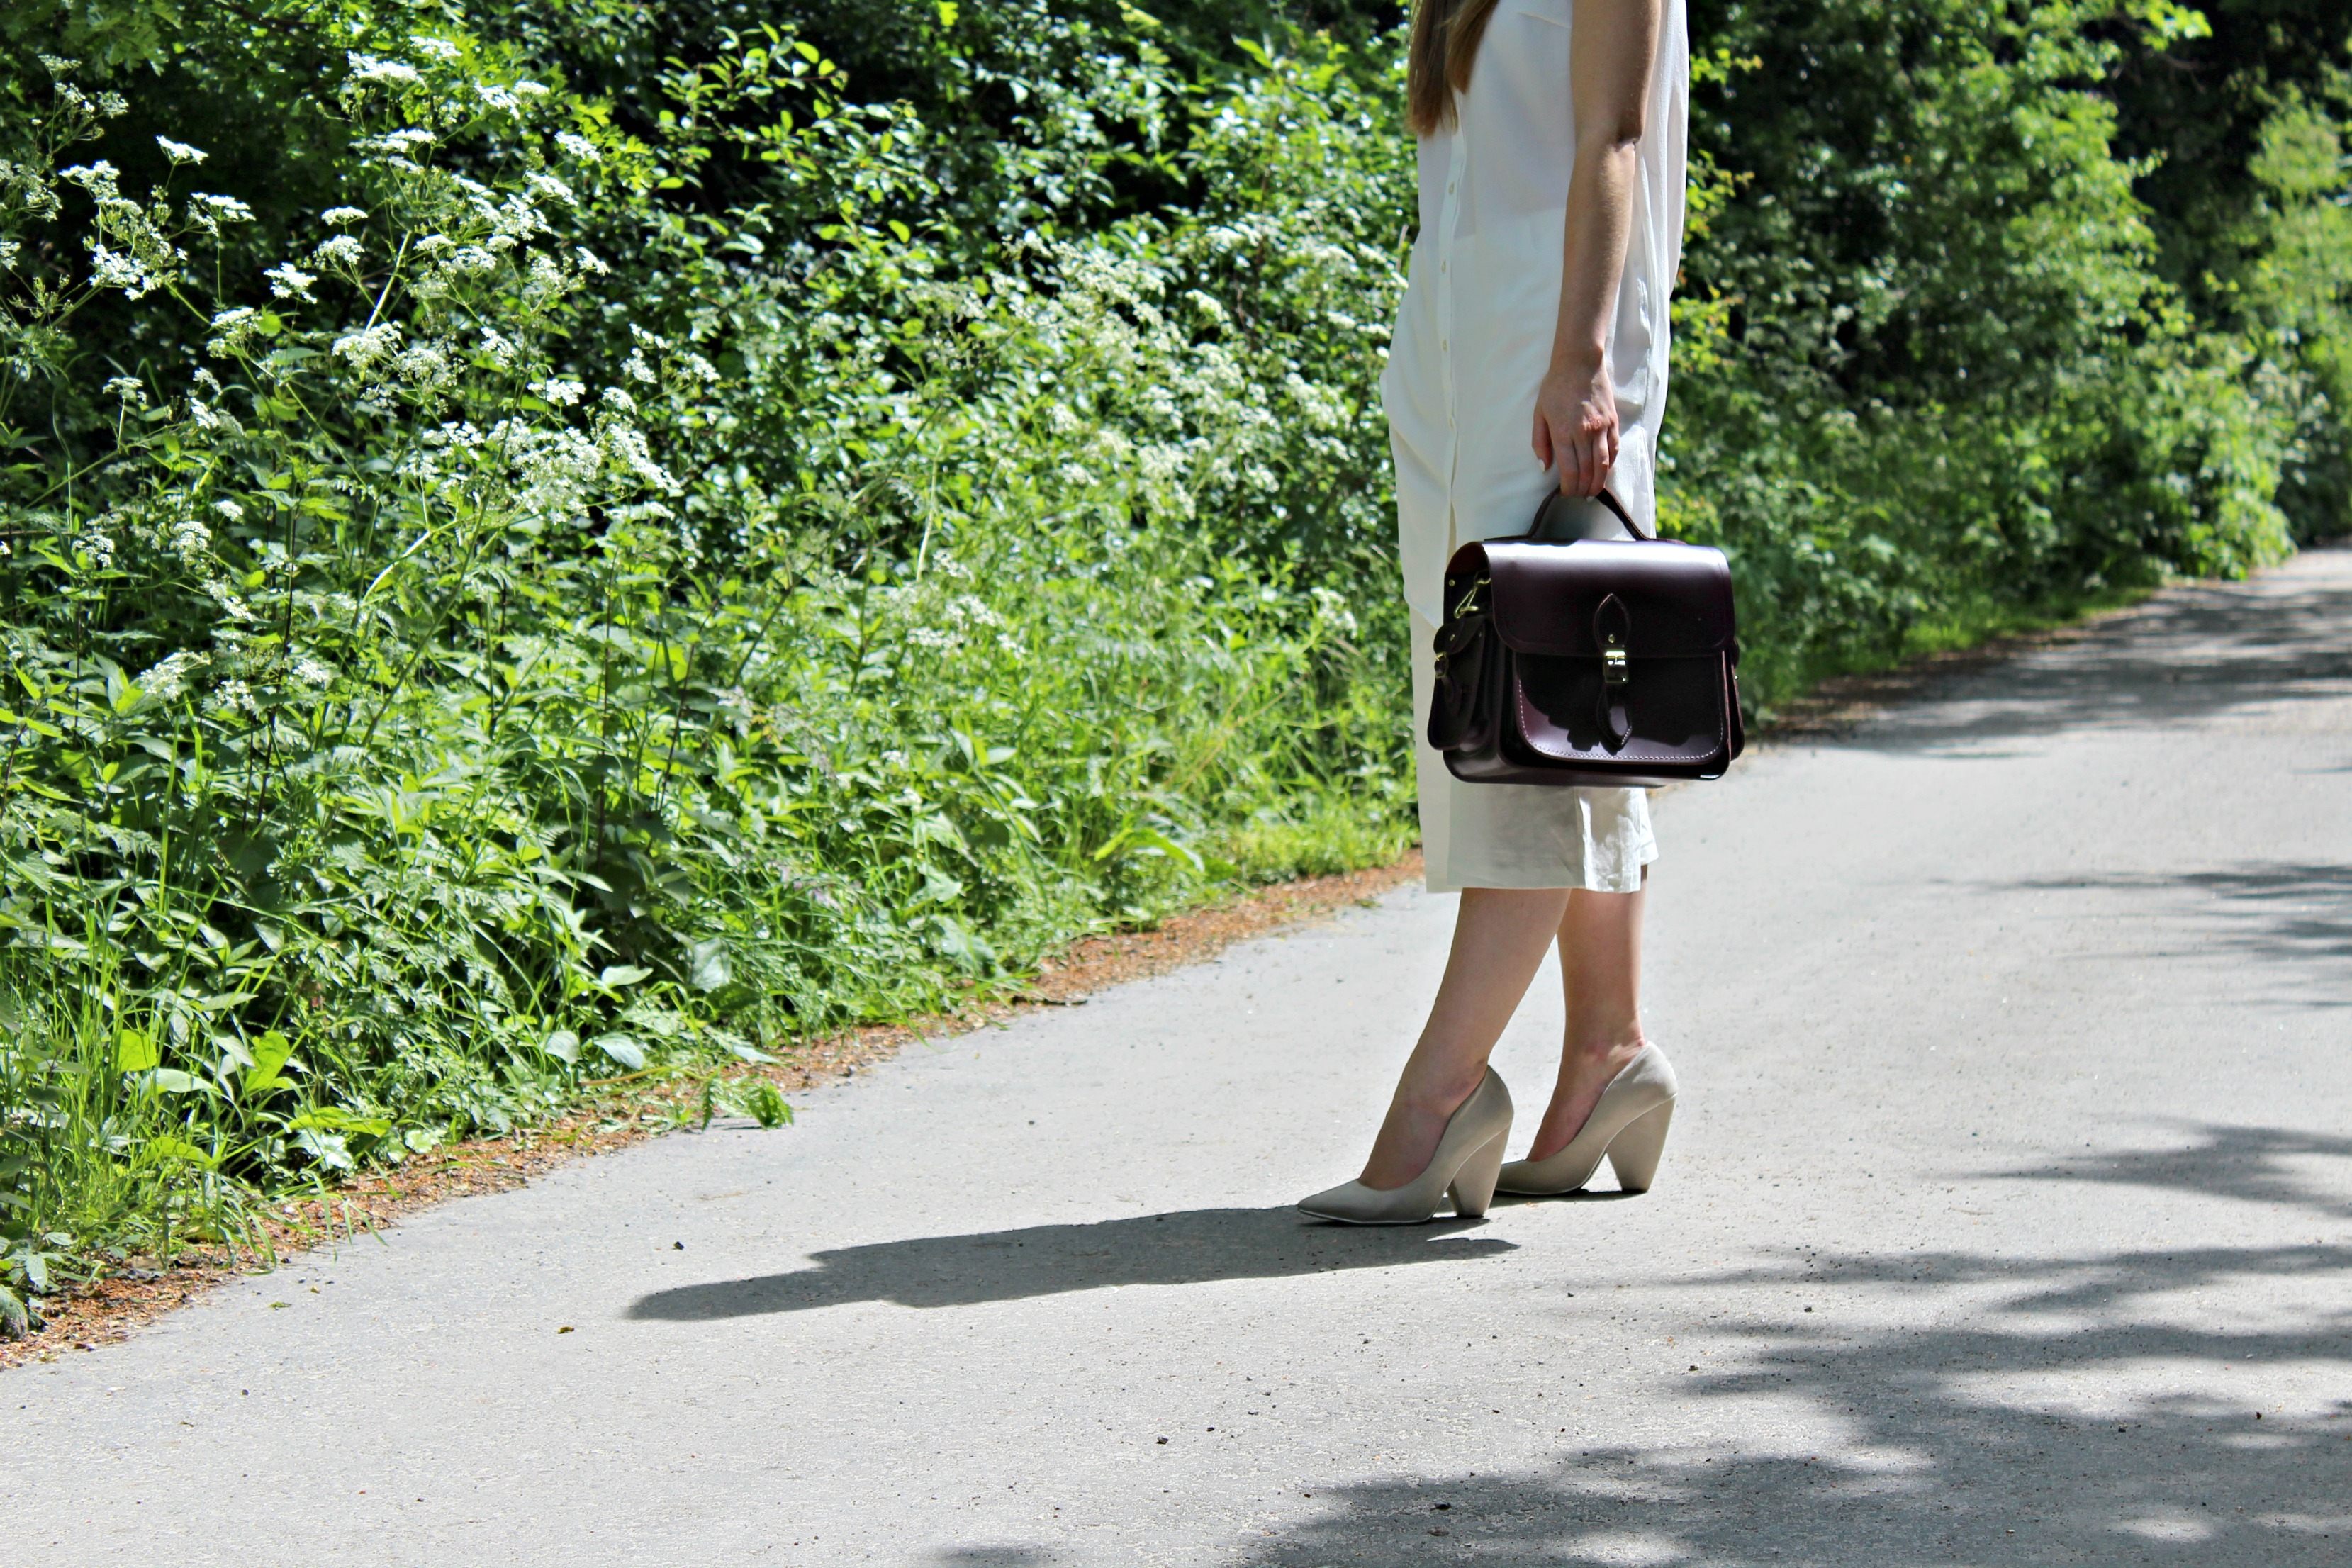 cambridge-satchel-company-traveller-bag